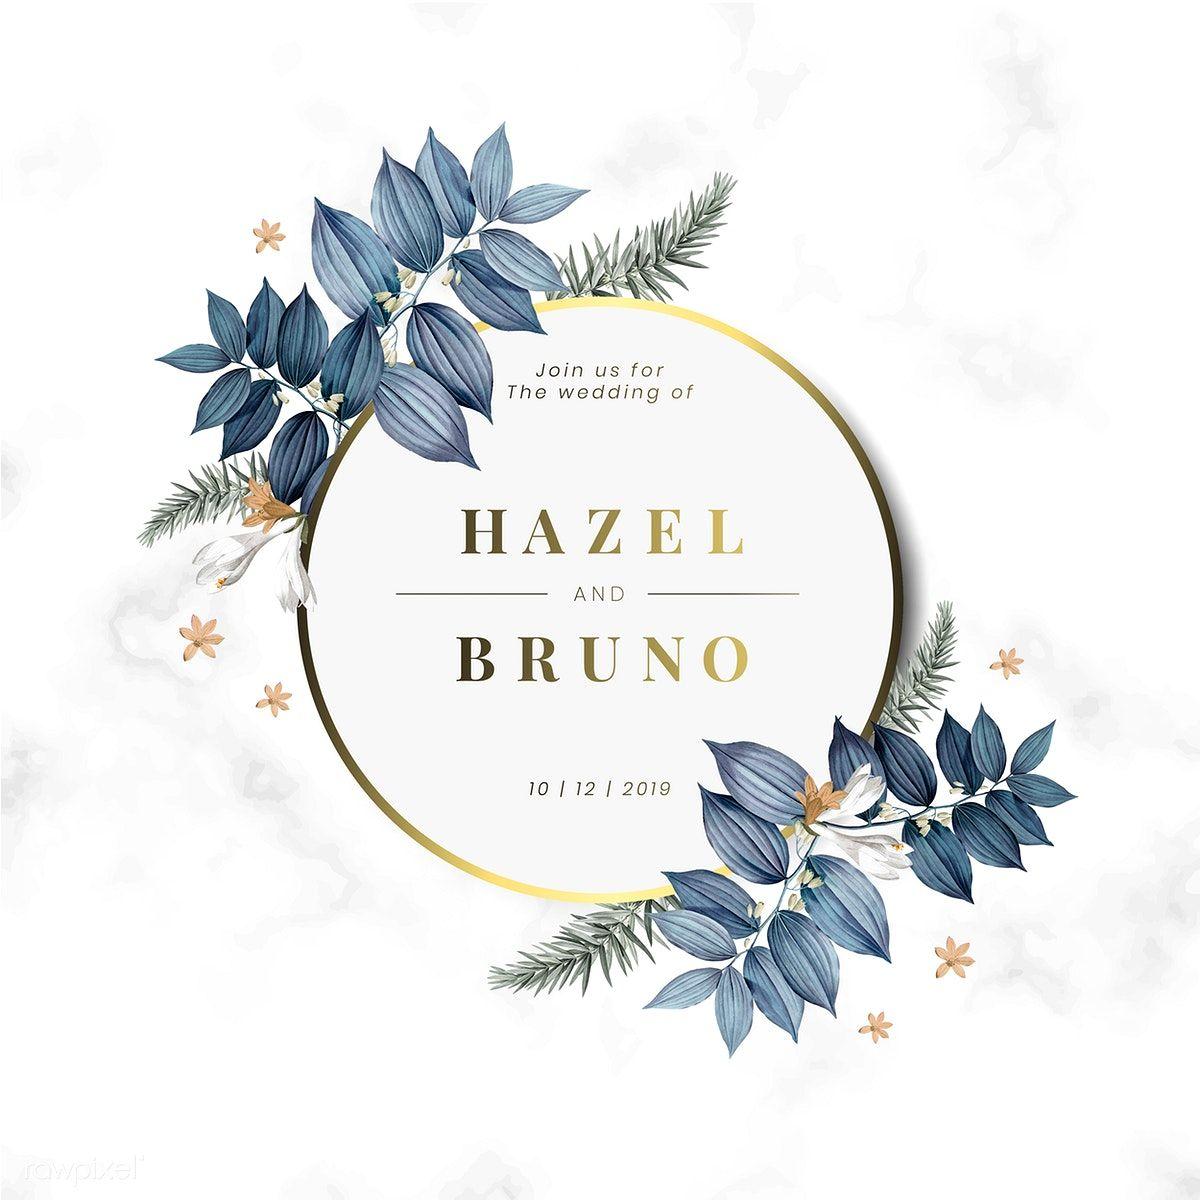 Download premium vector of Floral wedding invitation card